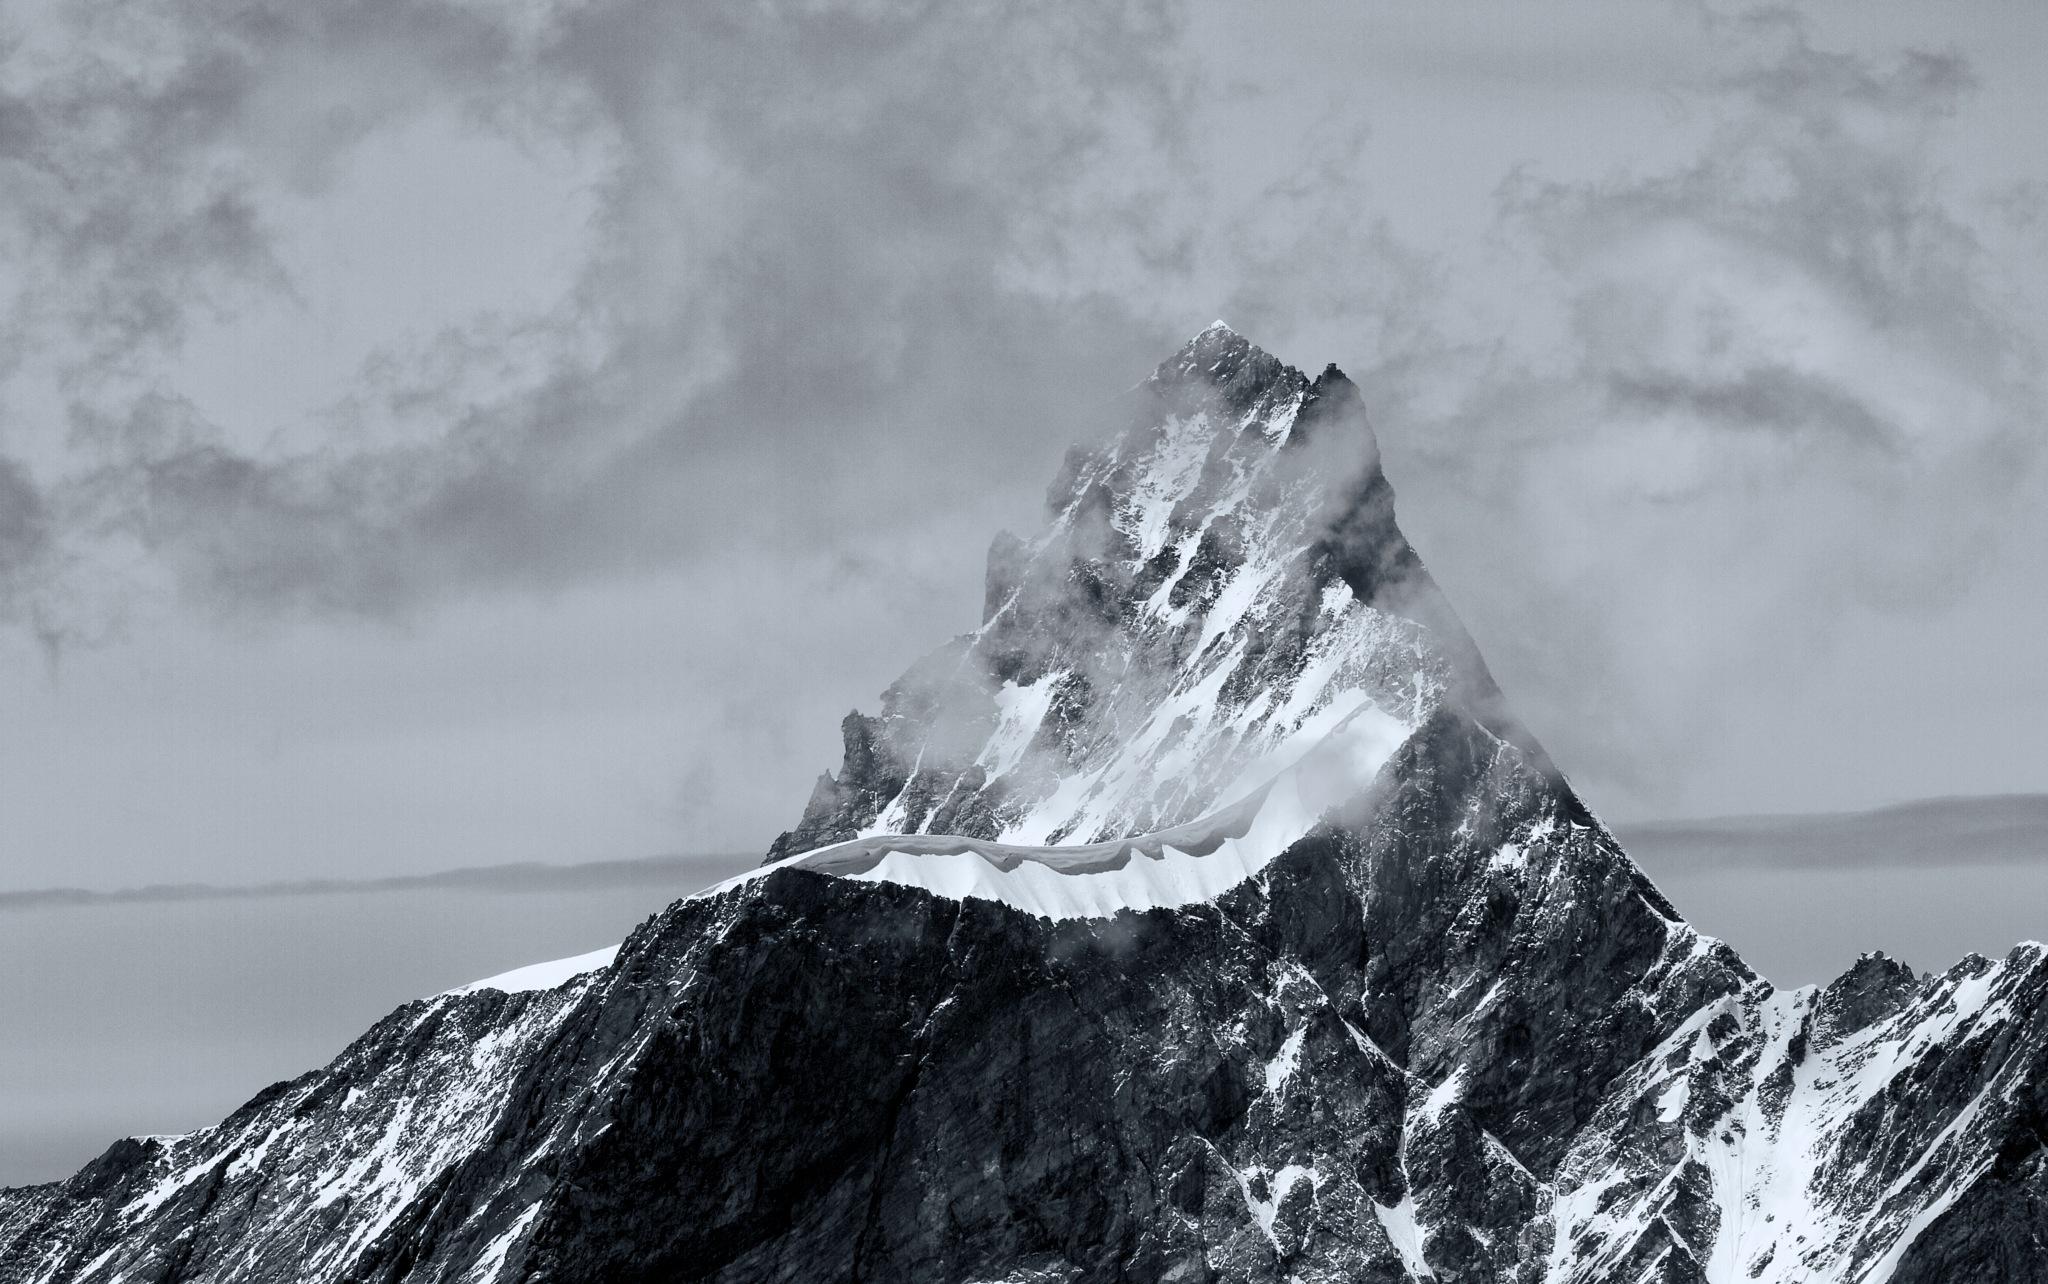 Mountain by Wim